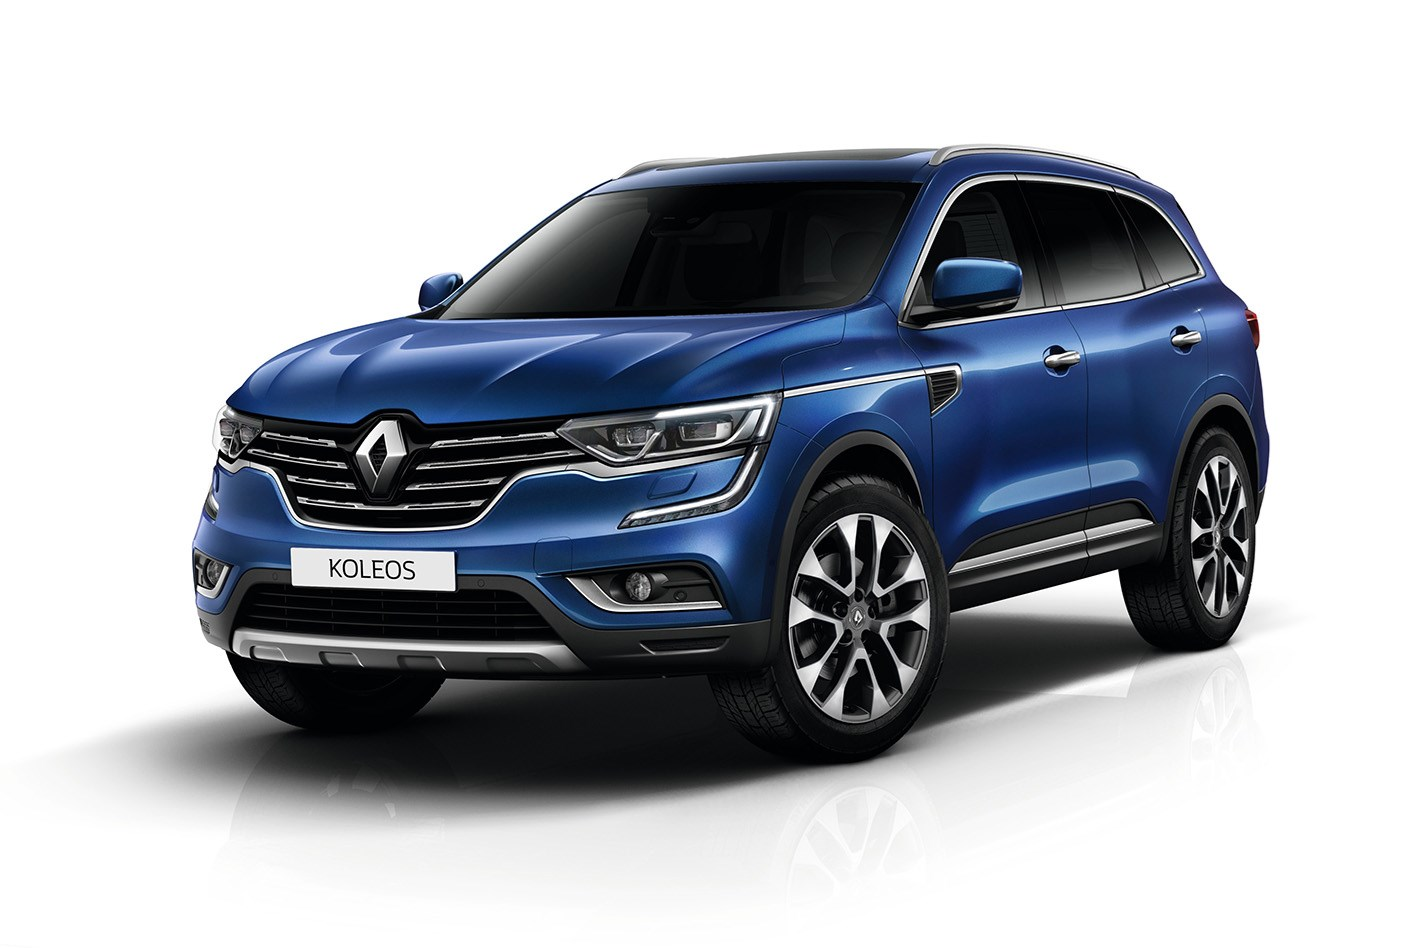 2017 Renault Koleos Life (4x2) 4D Wagon